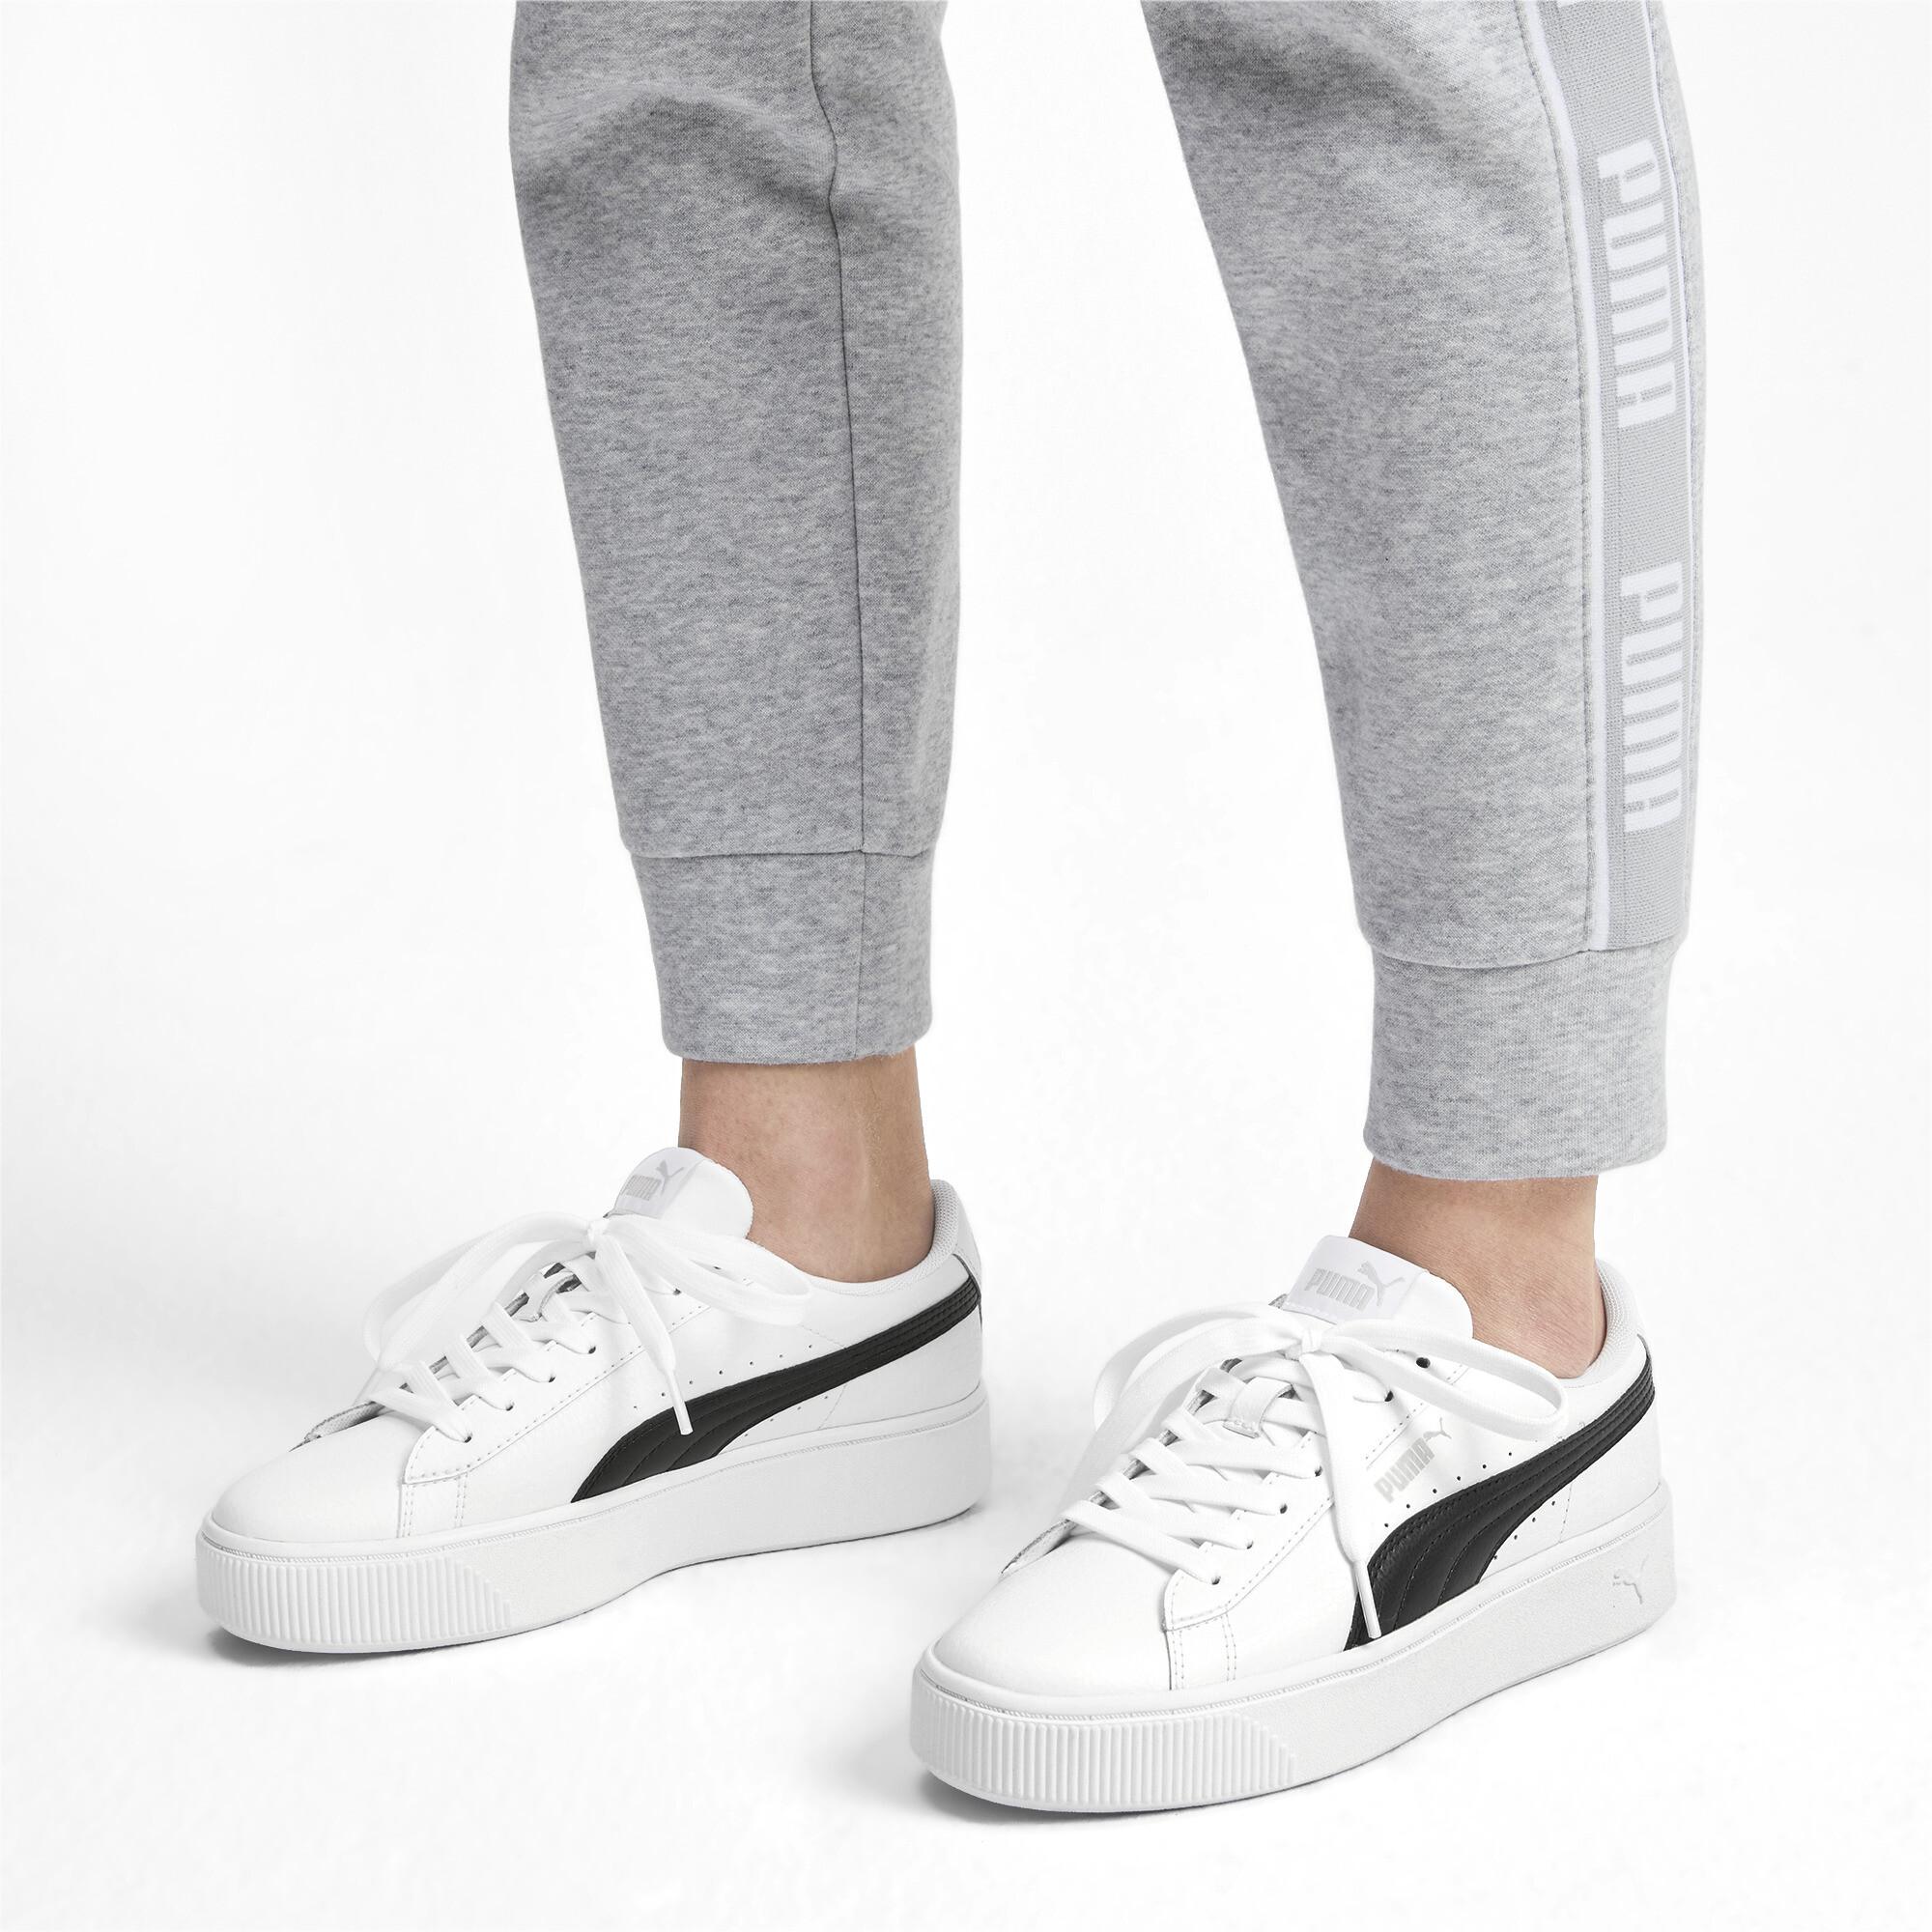 PUMA Vikky Stacked Damen Sneaker Frauen Schuhe Basics Neu | eBay